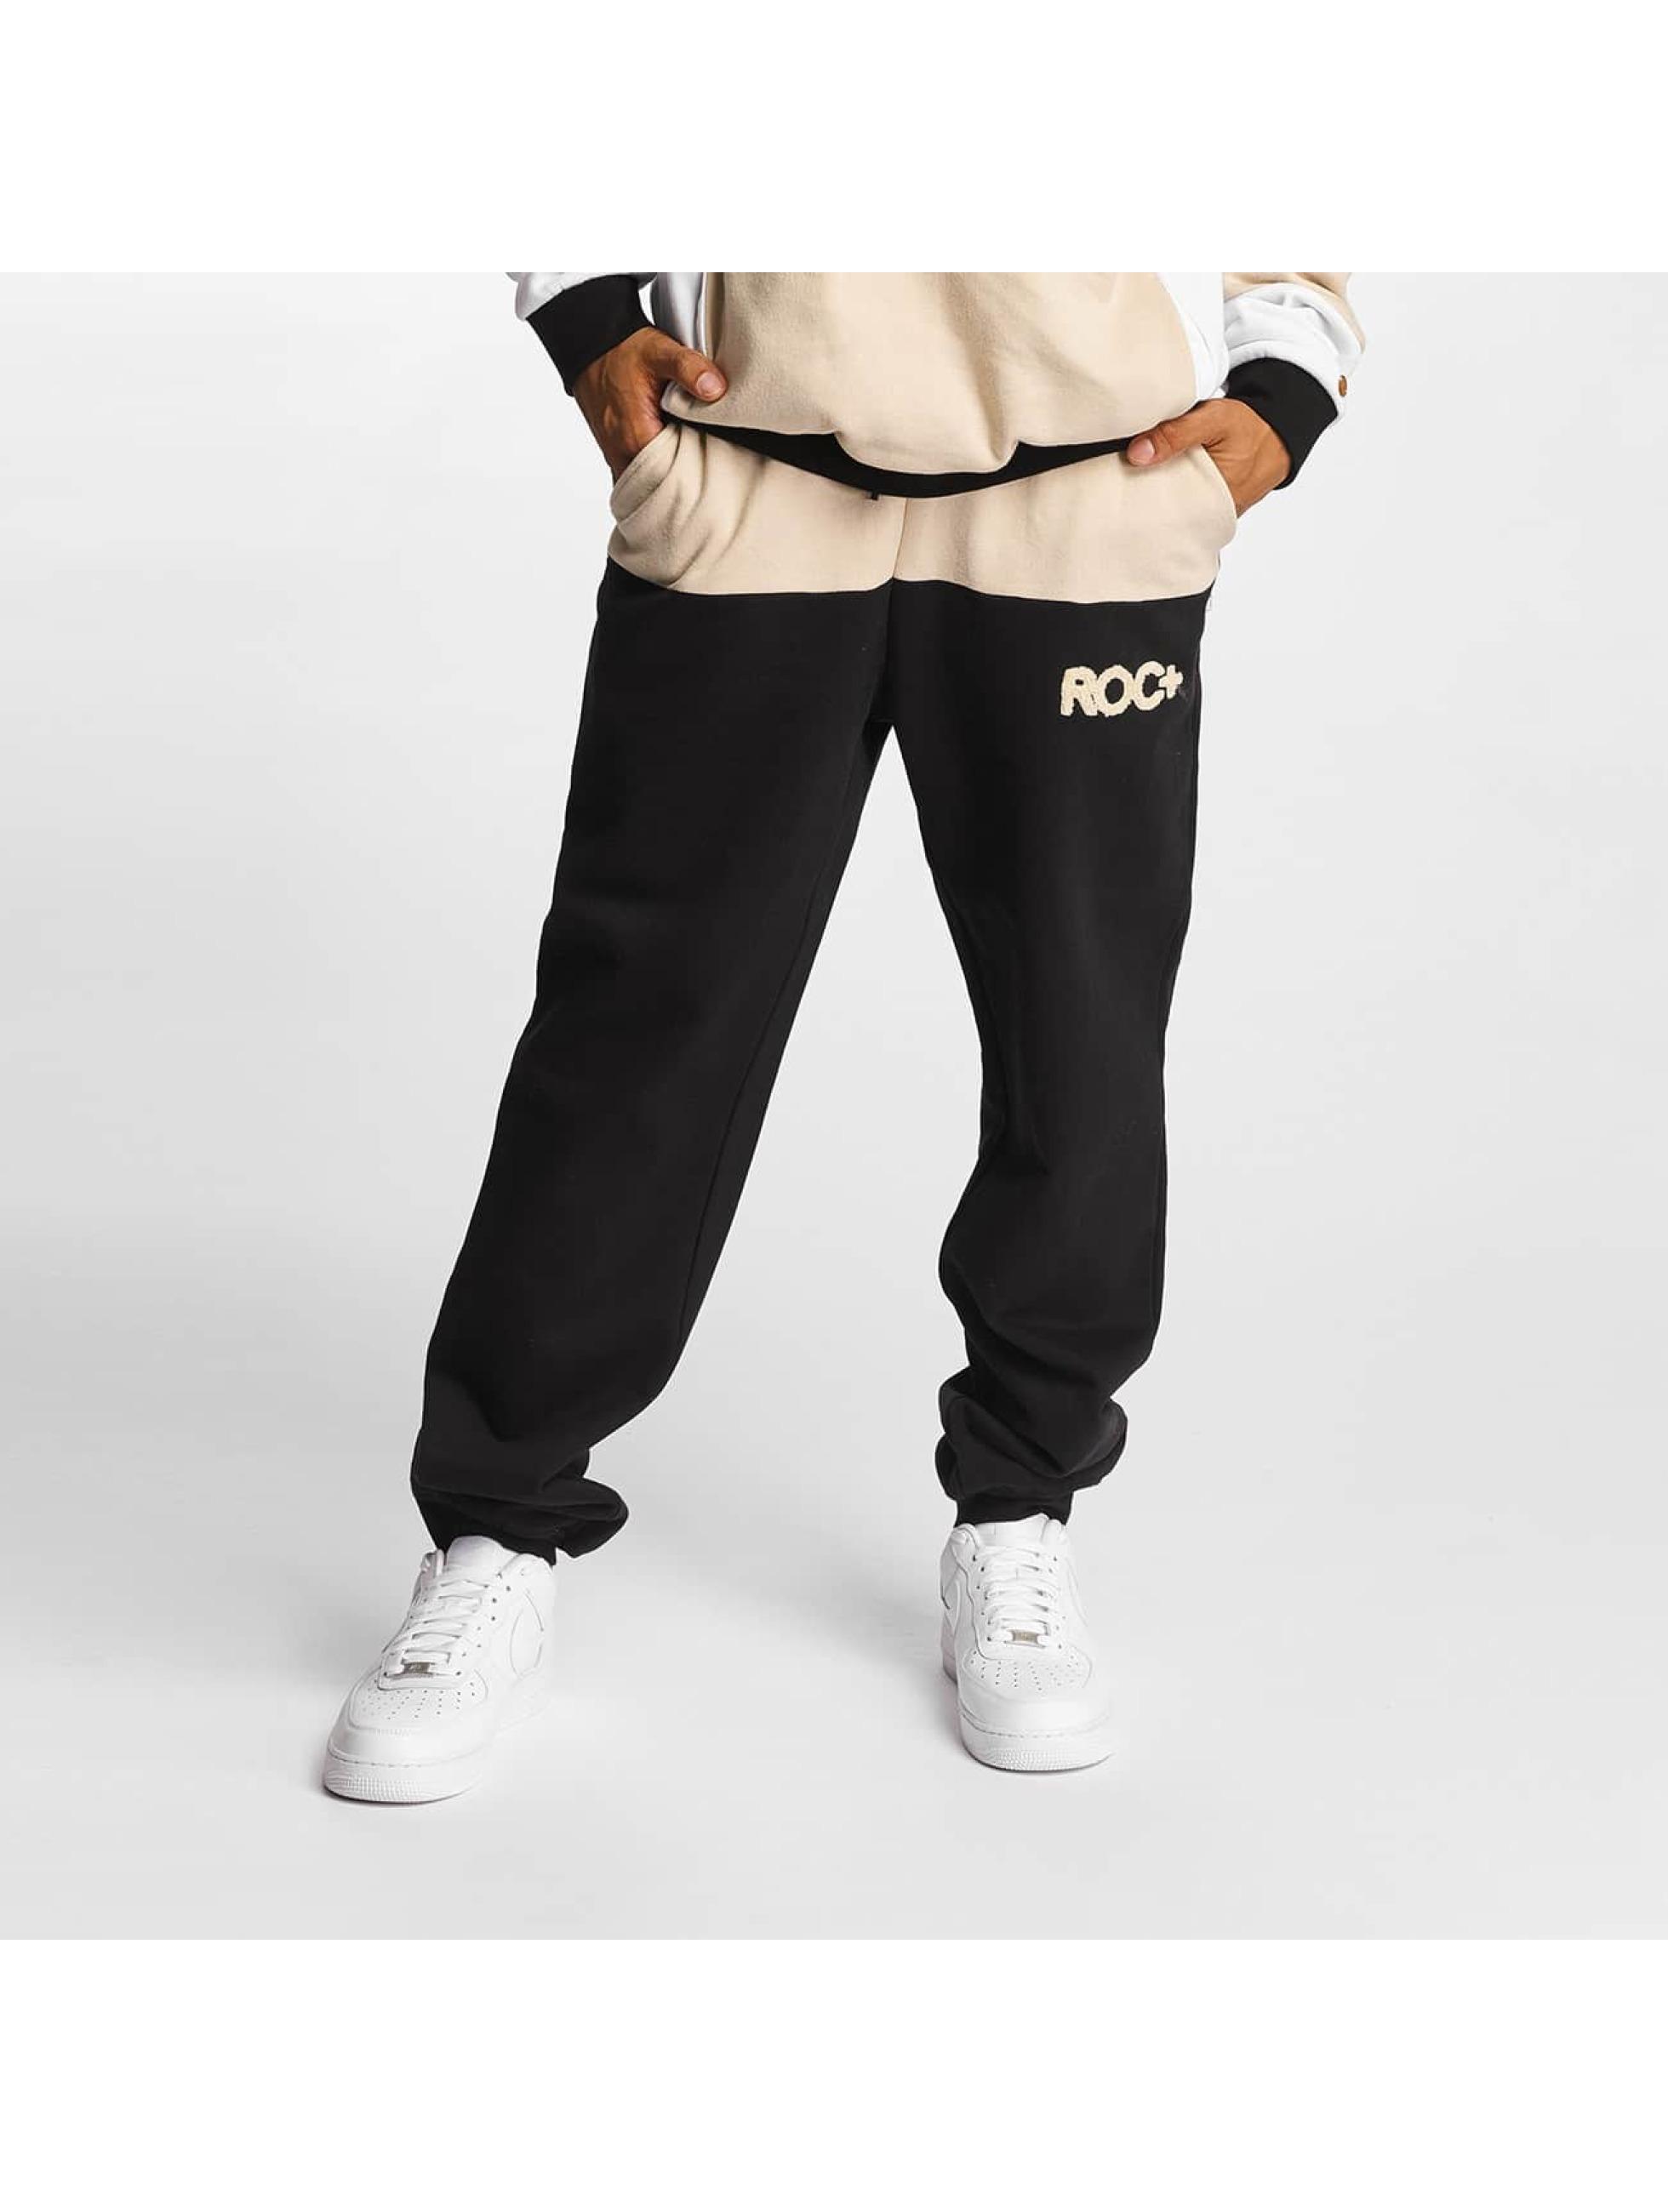 Rocawear Männer Jogginghose Retro Sport Fleece in schwarz